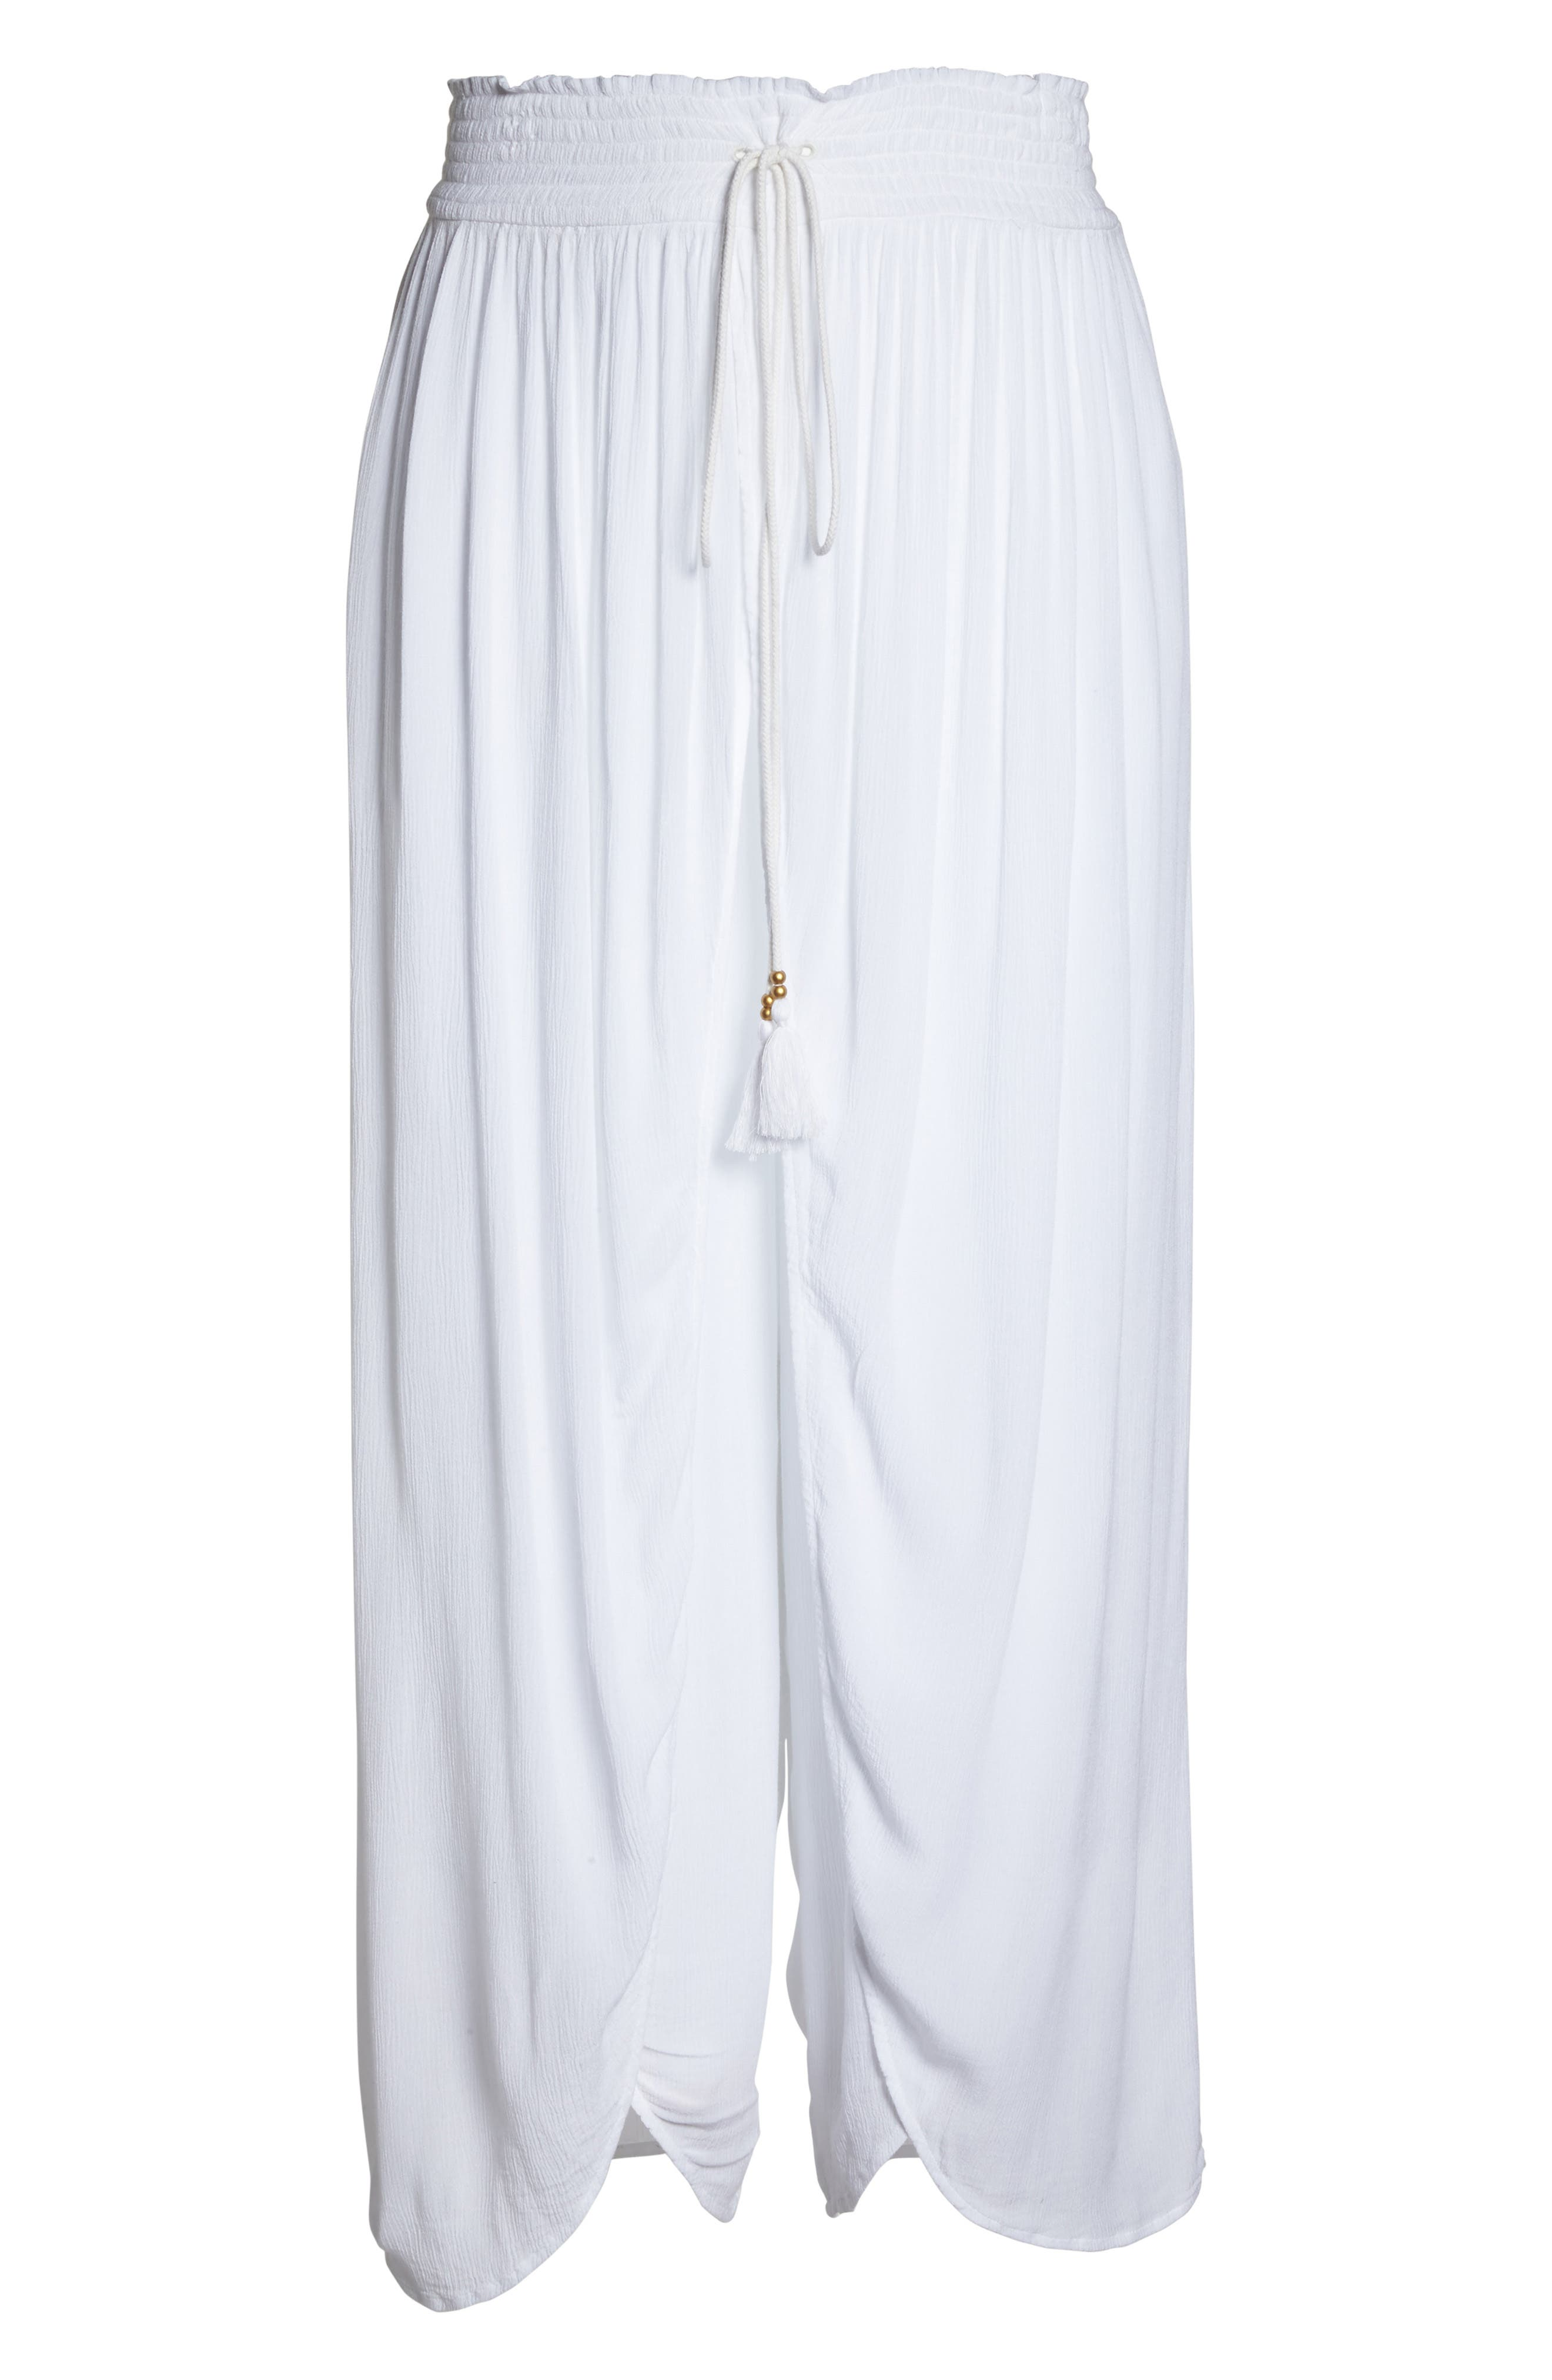 Gauze Cover-Up Pants,                             Alternate thumbnail 6, color,                             White